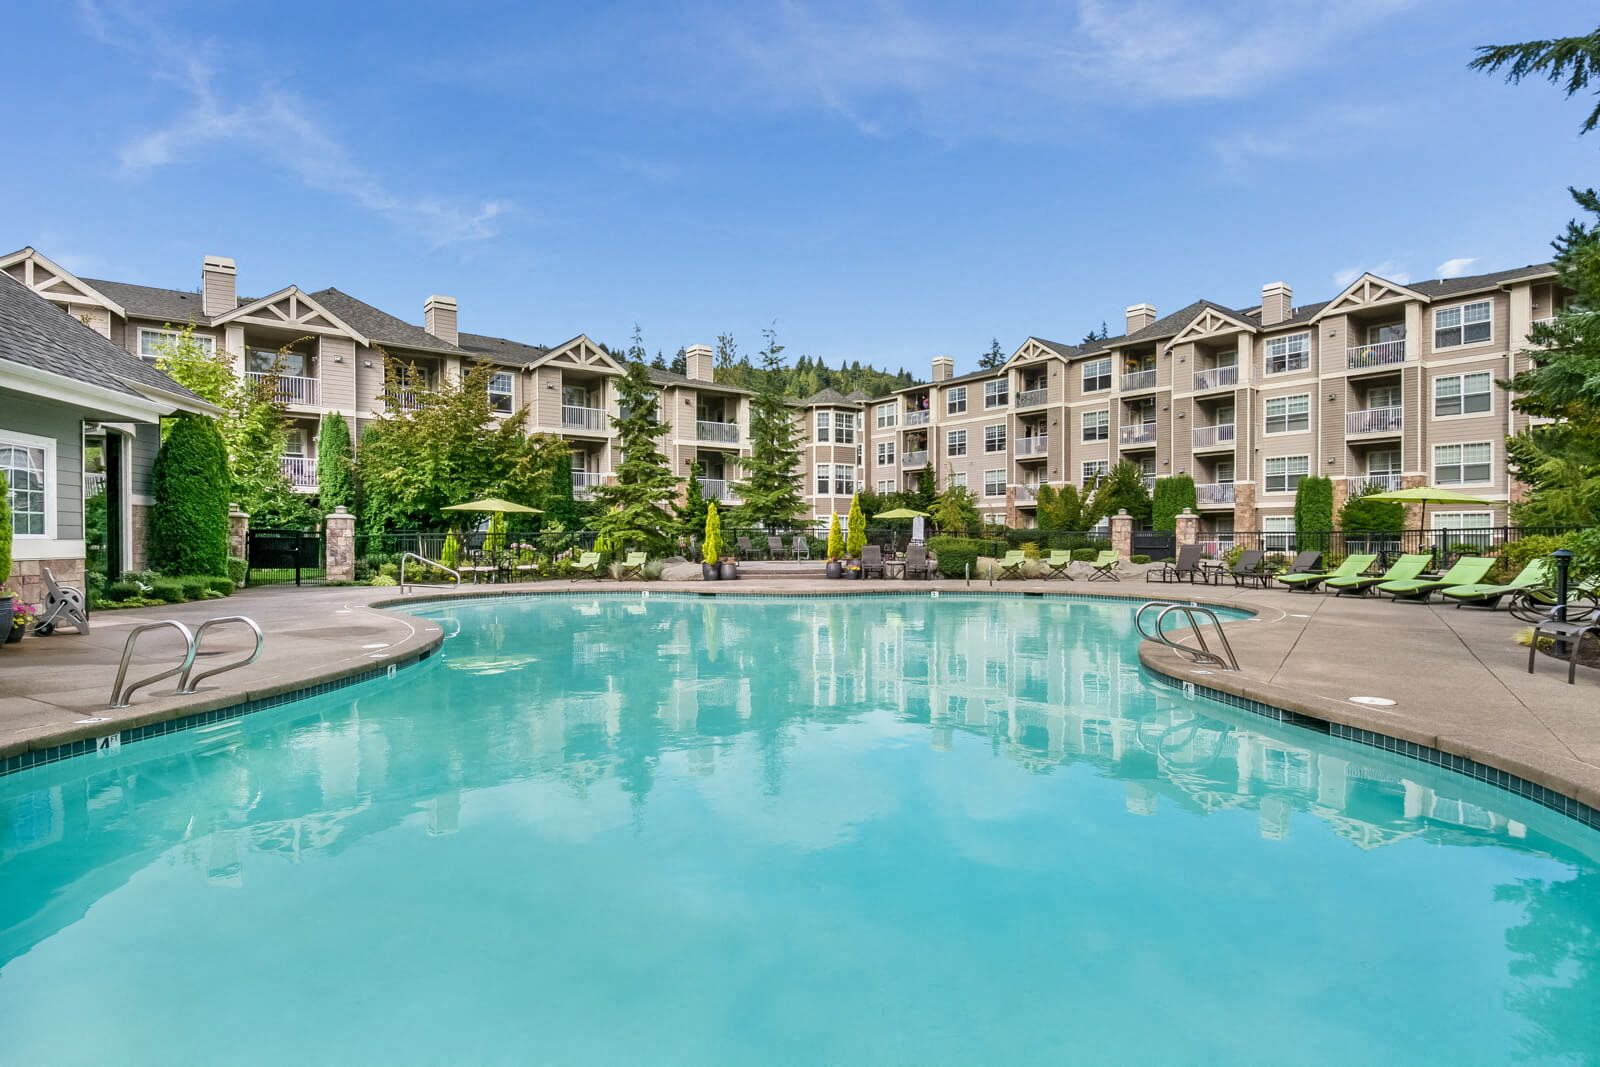 Poolside Sundeck at The Estates at Cougar Mountain, Issaquah, Washington